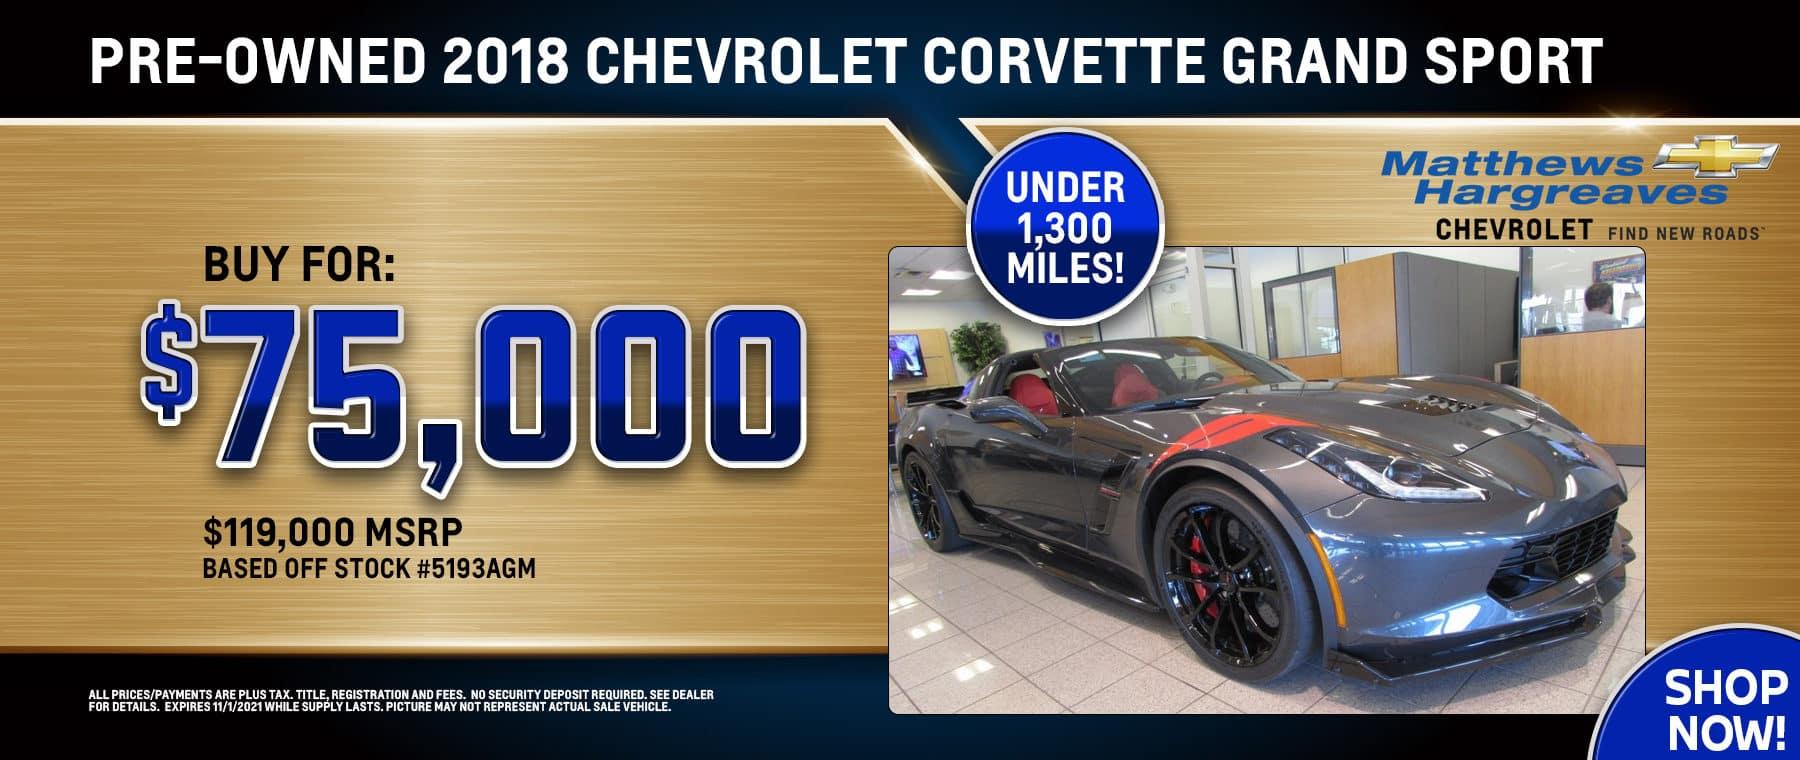 10_21_Champion_MH_Chevy_1800x760_PO_2018_Chevy_Corvette_Grand_Sport_desktop